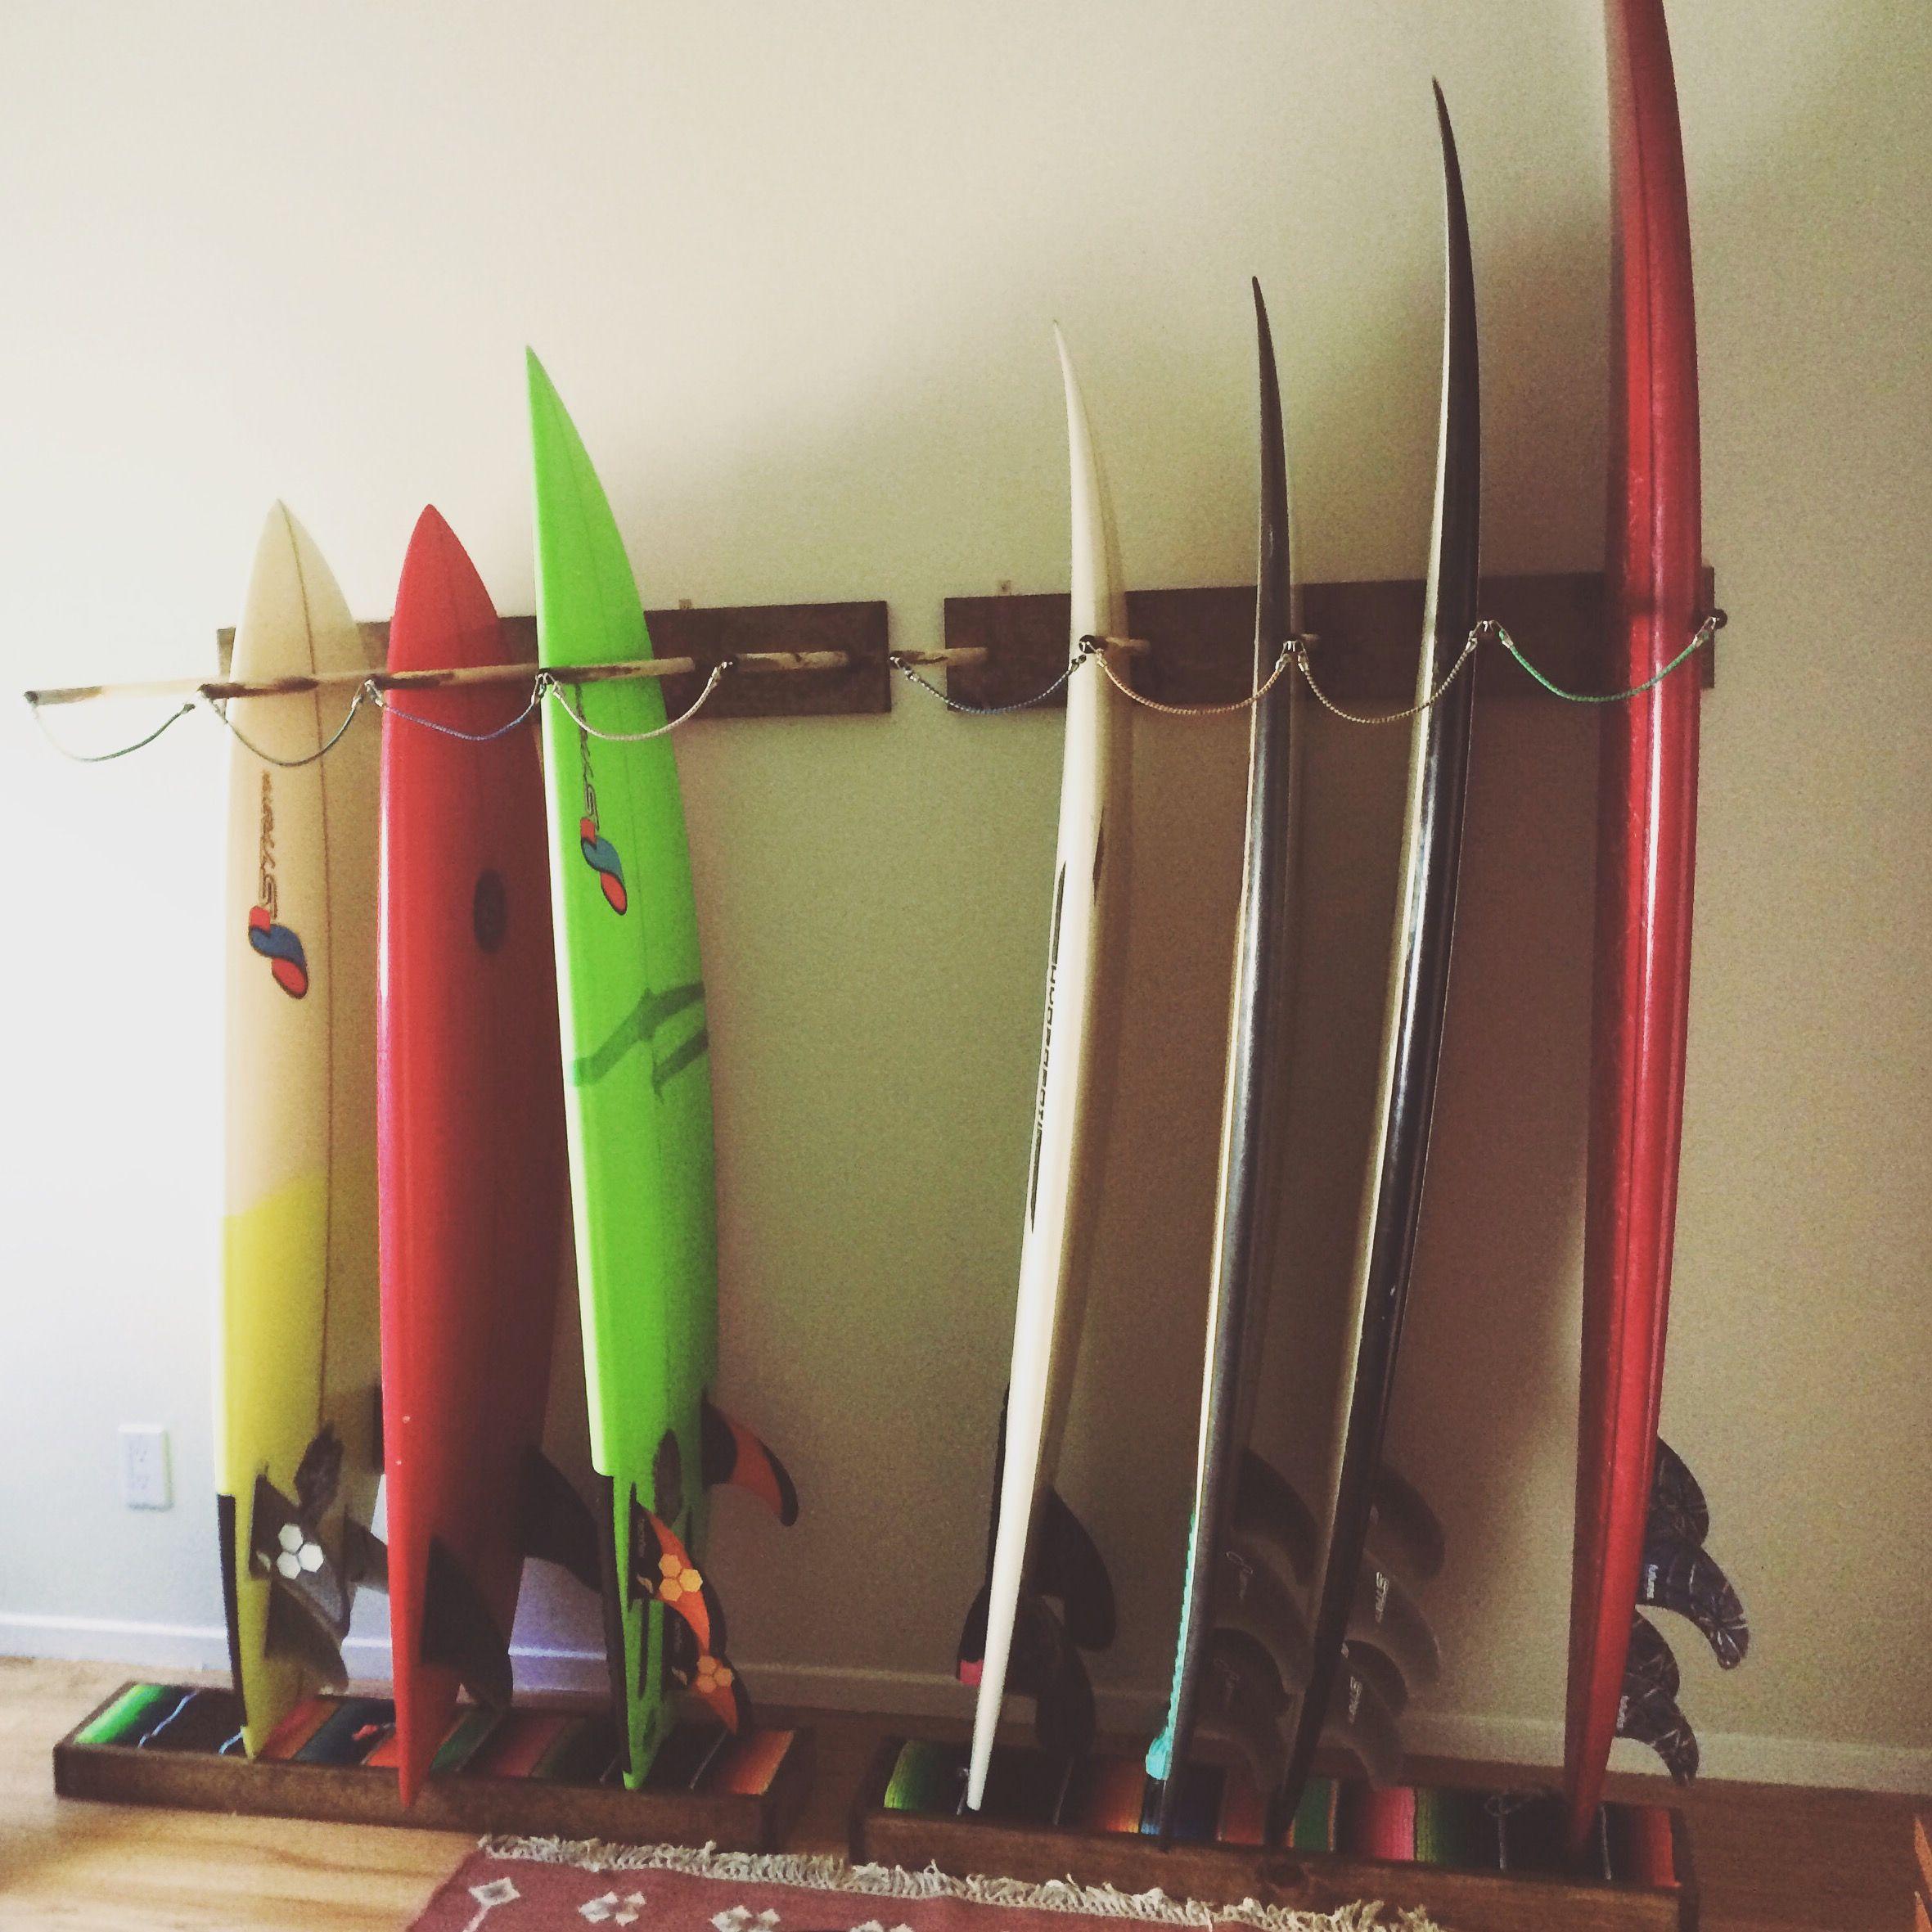 Diy Surfboard Rack Diy Pinterest Surfboard Rack